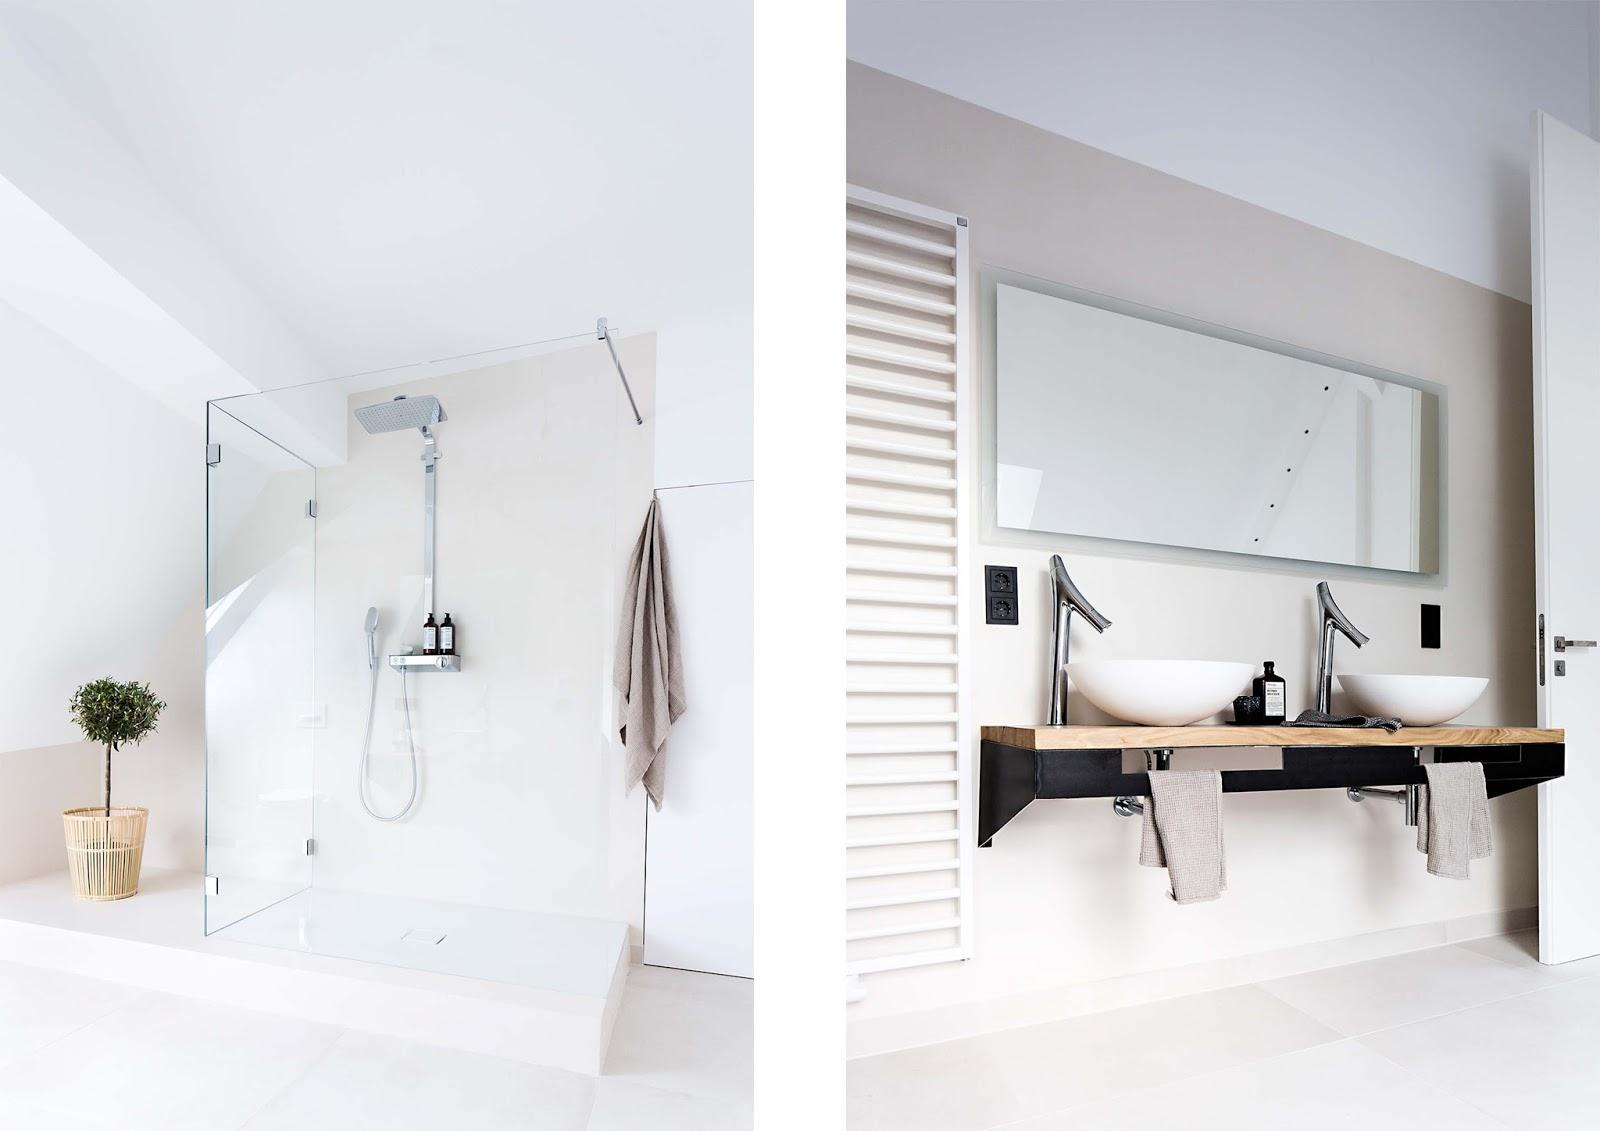 Loft in stile newyorkese con vista su berlino arc art for Appartamento stile newyorkese